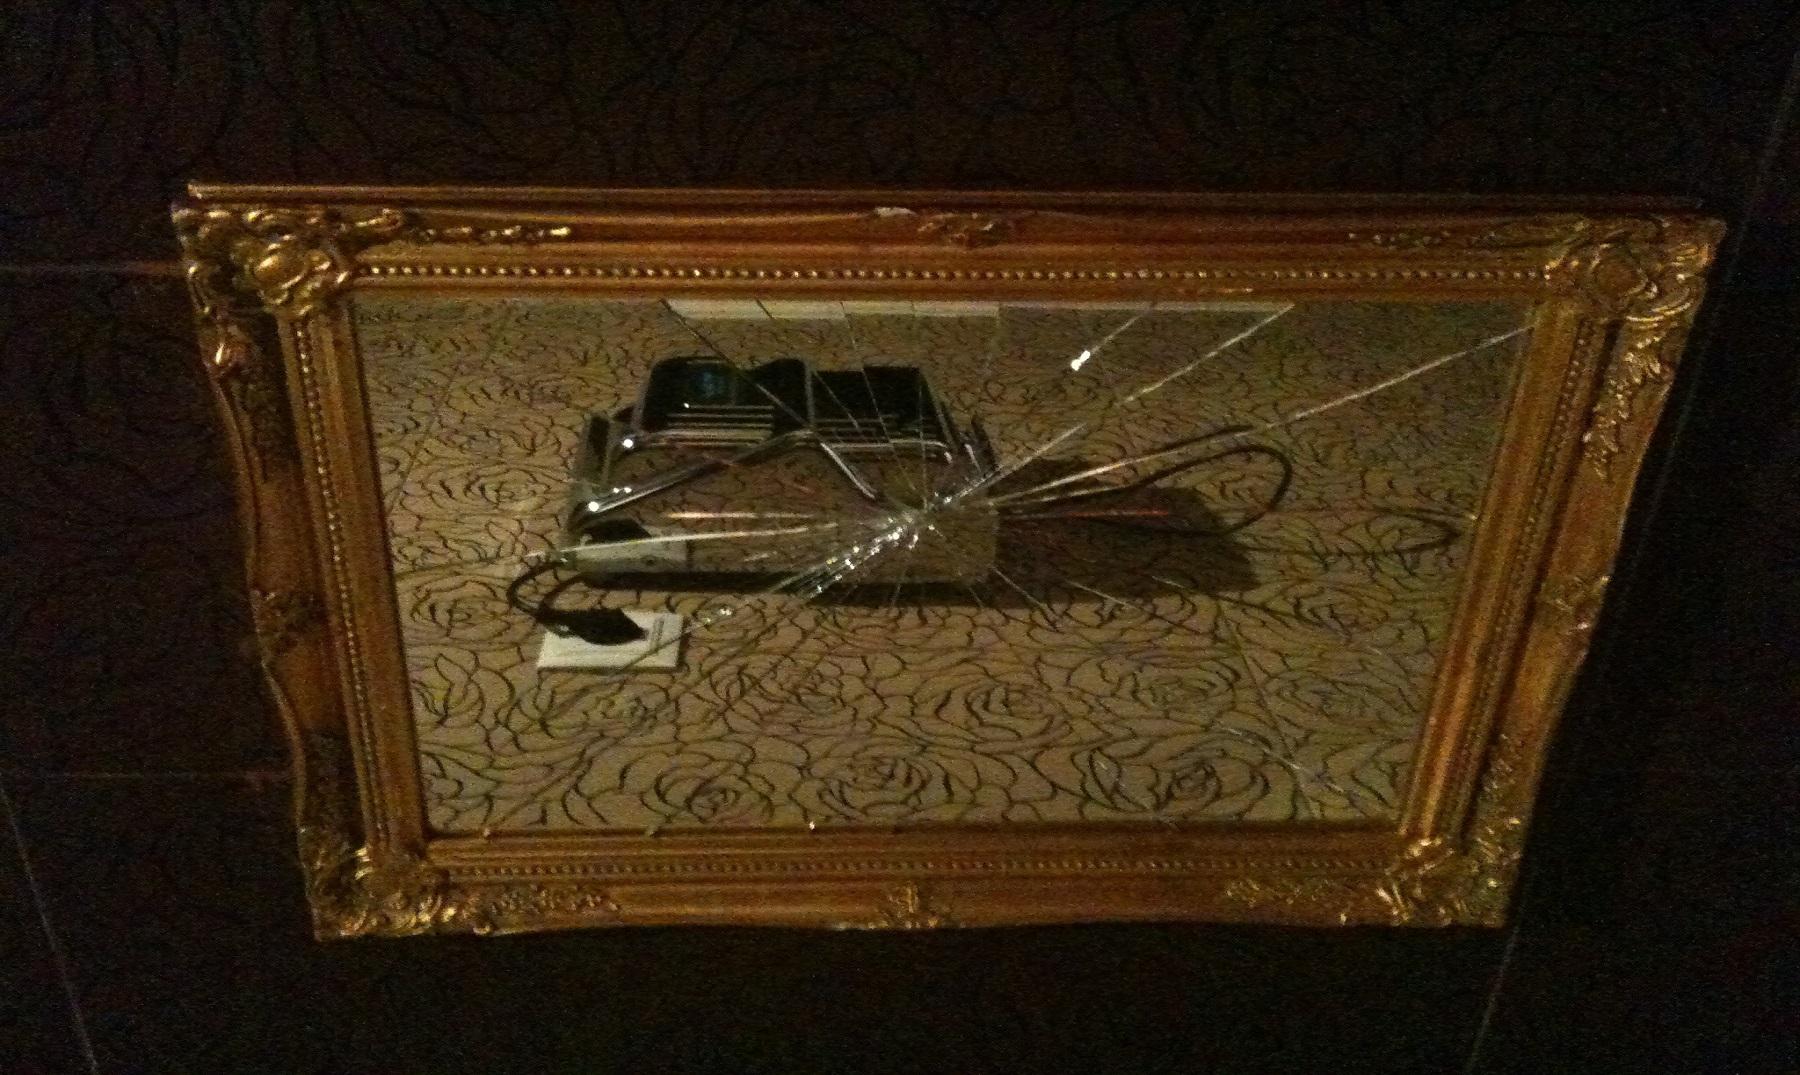 Por qu romper un espejo trae mala suerte - Romper un plato trae mala suerte ...